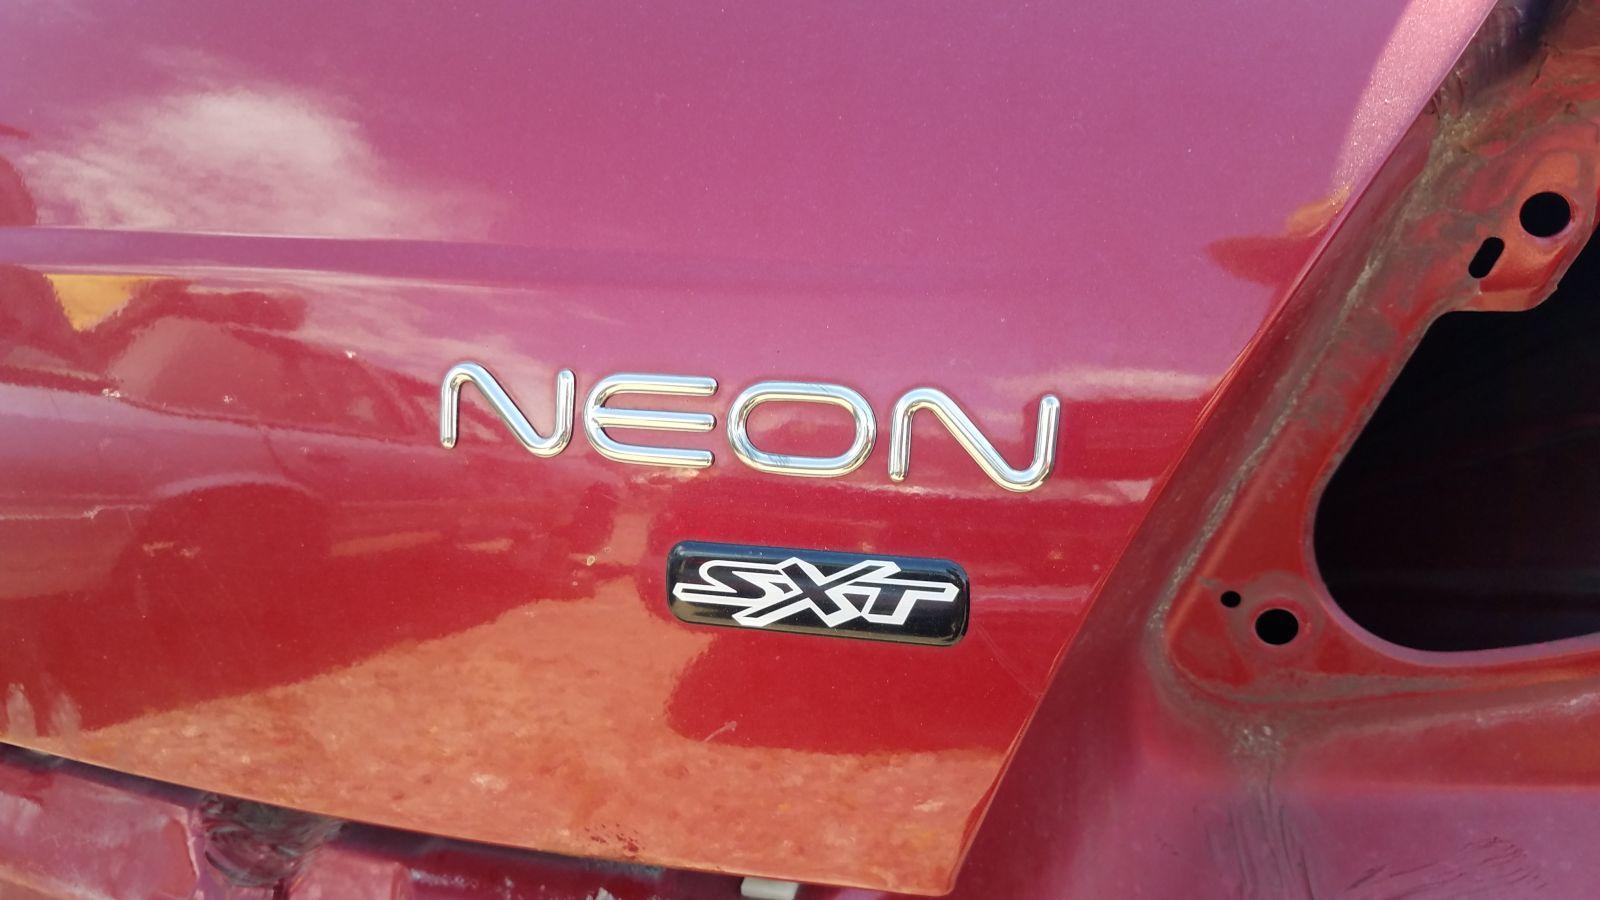 2005 Dodge Neon Sxt Is A Last Of Its Kind Junkyard Gem